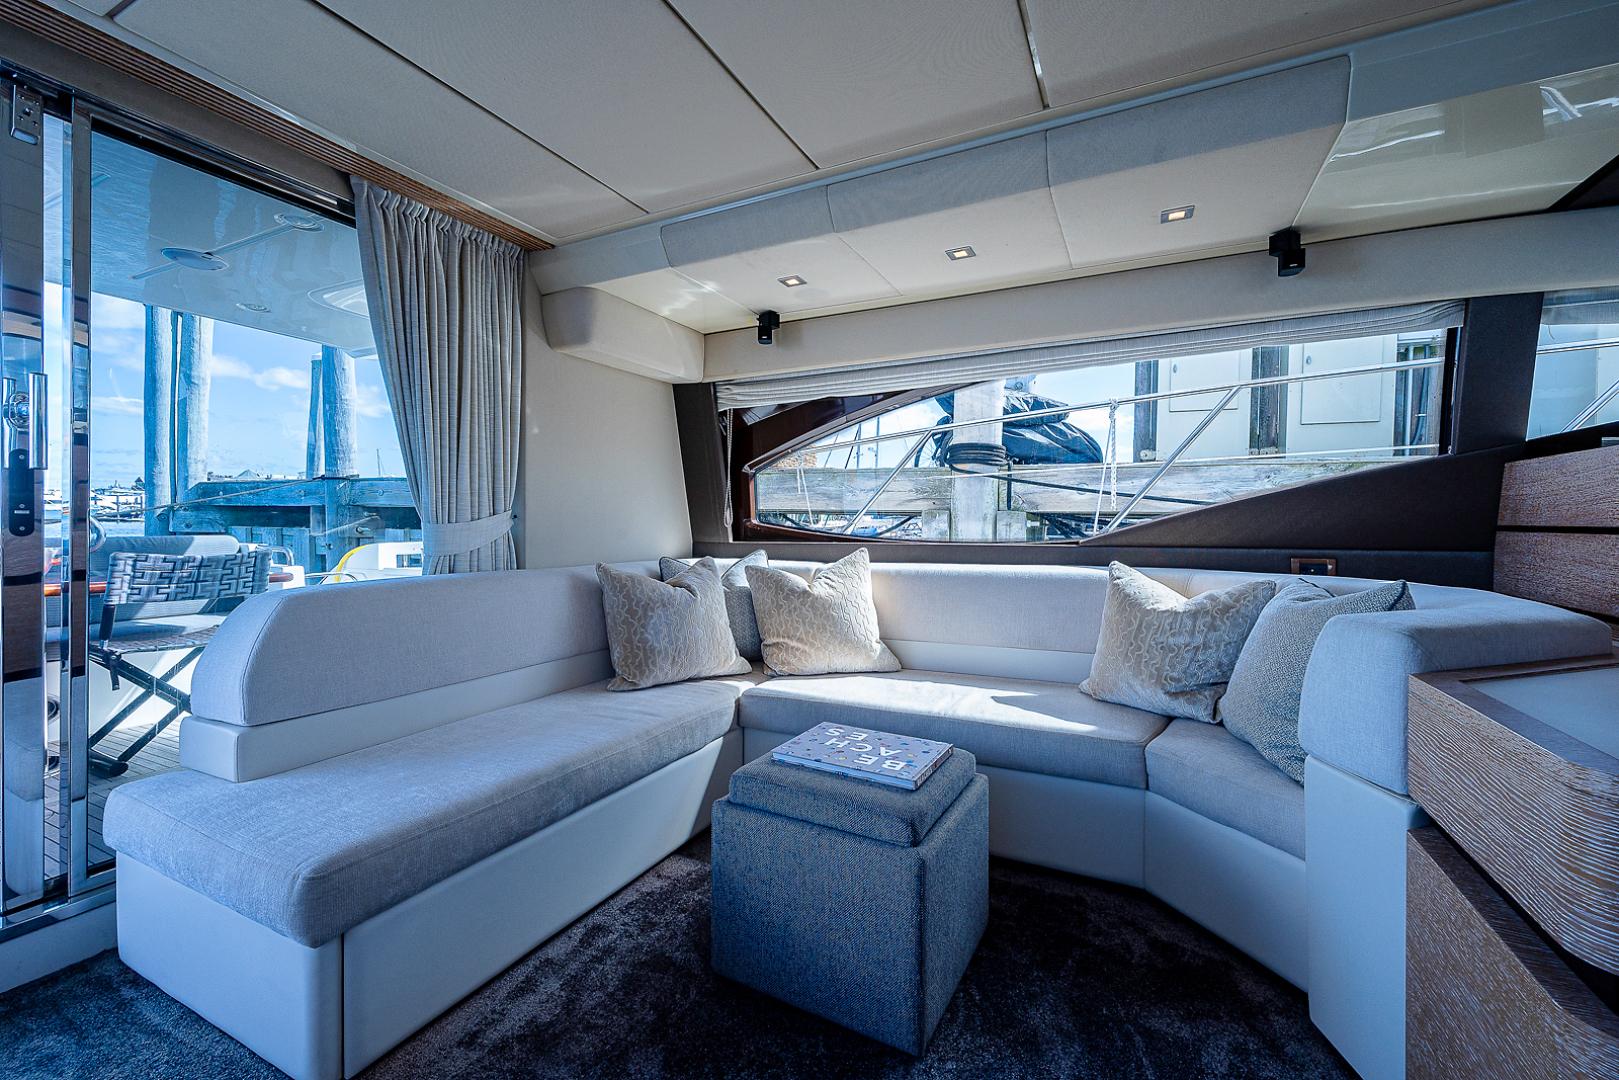 Azimut-58 Fly Motor Yacht 2011-Nova Fort Lauderdale-Florida-United States-58_azimut_nova__salon11-1490469 | Thumbnail